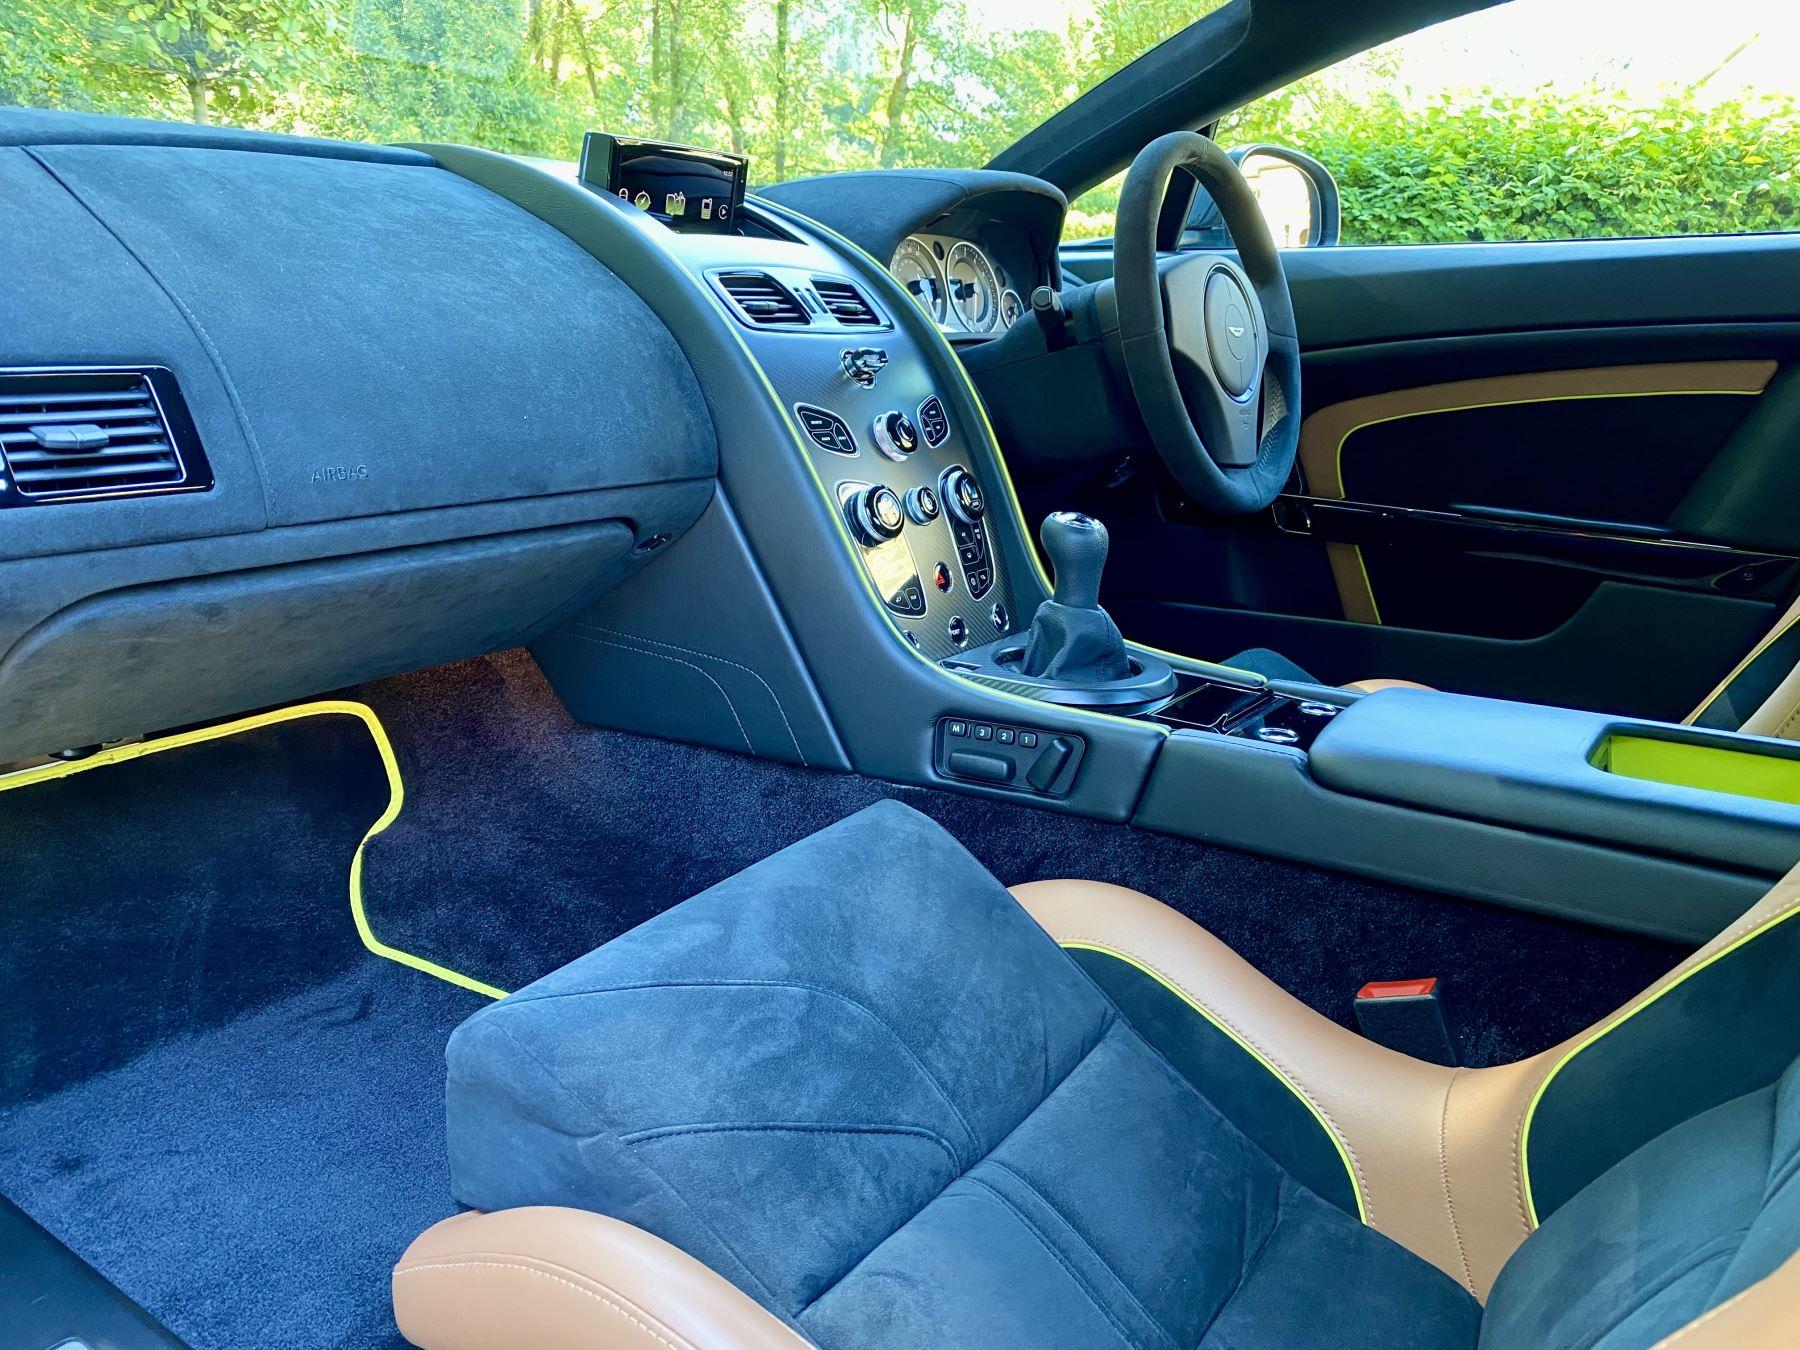 Aston Martin V12 Vantage AMR 6.0 V12 600BHP Manual 1 of 100.     1 Owner From New, Full Aston Martin History. image 25